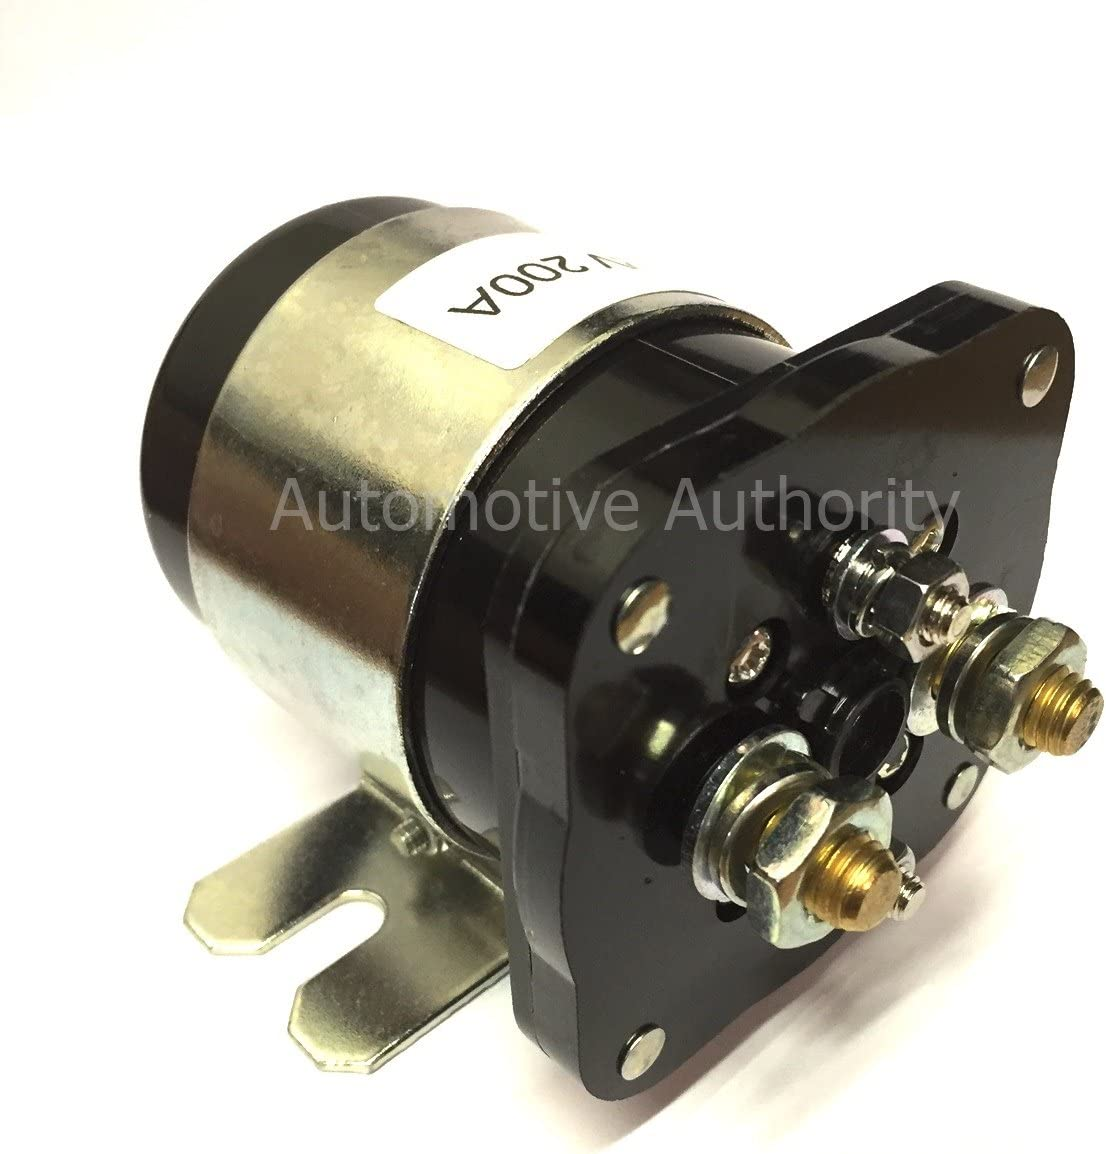 Automotive Authority 12V Solenoid Relay